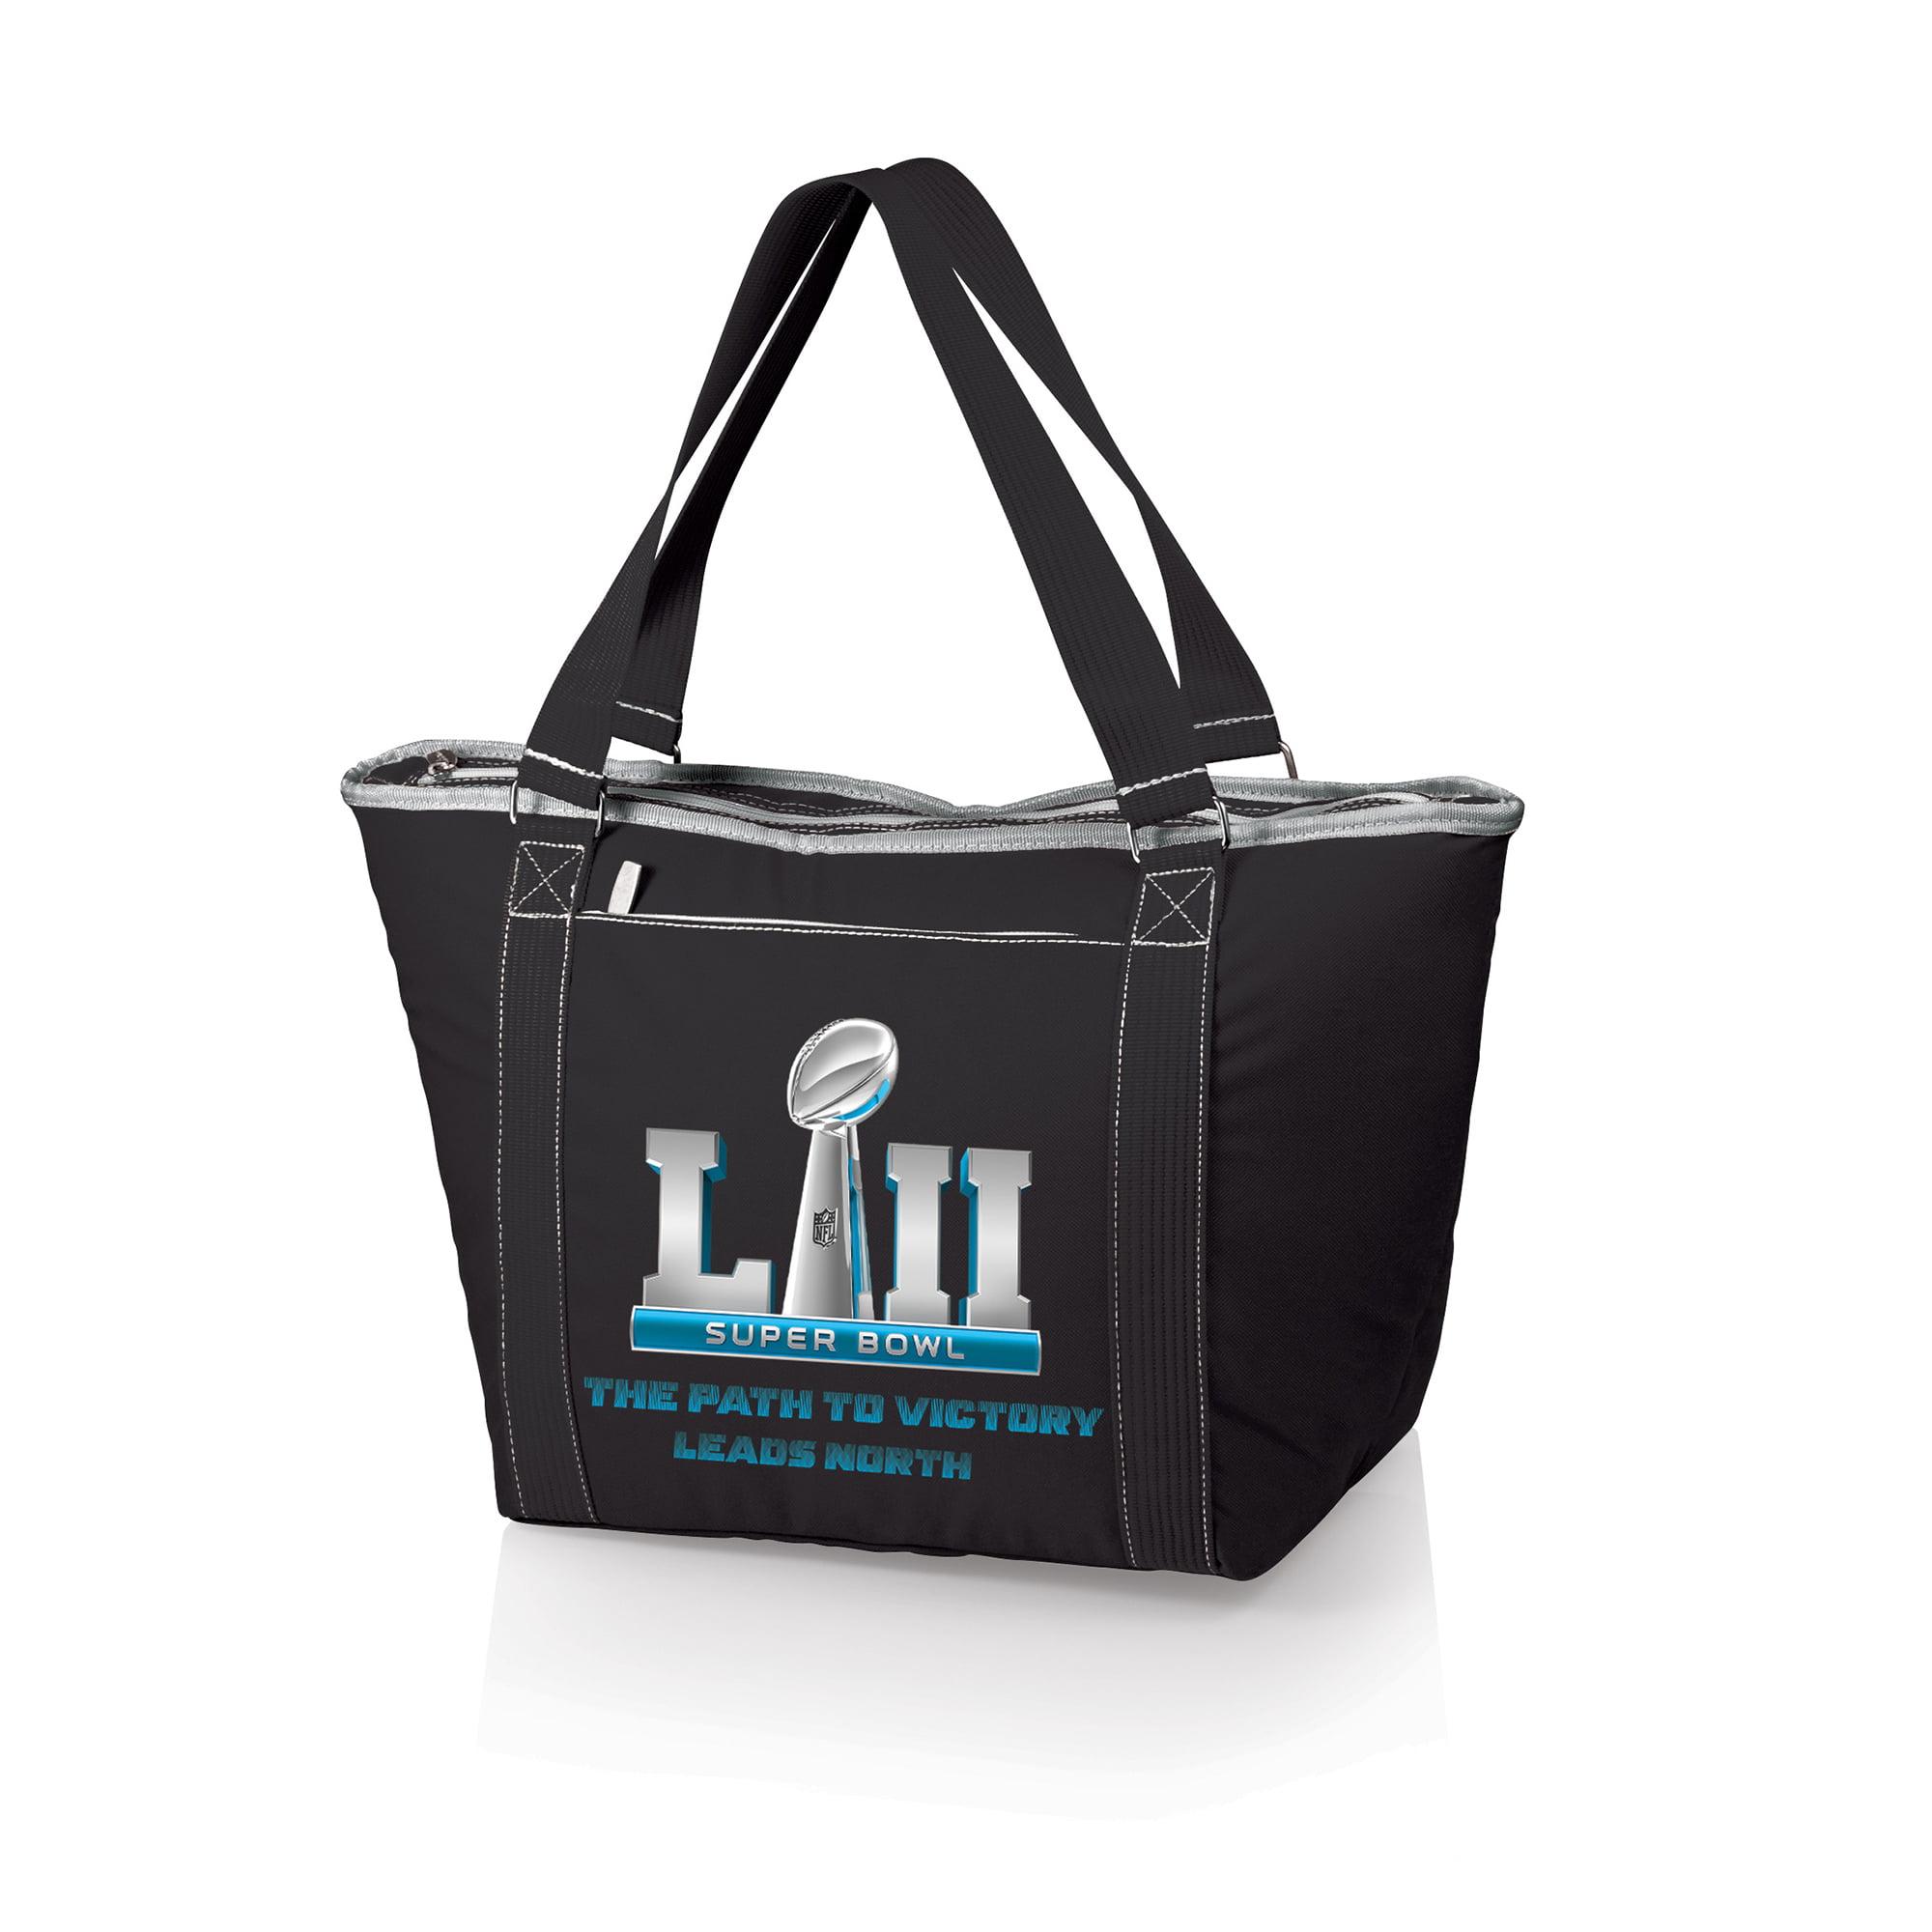 Super Bowl LII Topanga Cooler Tote - No Size